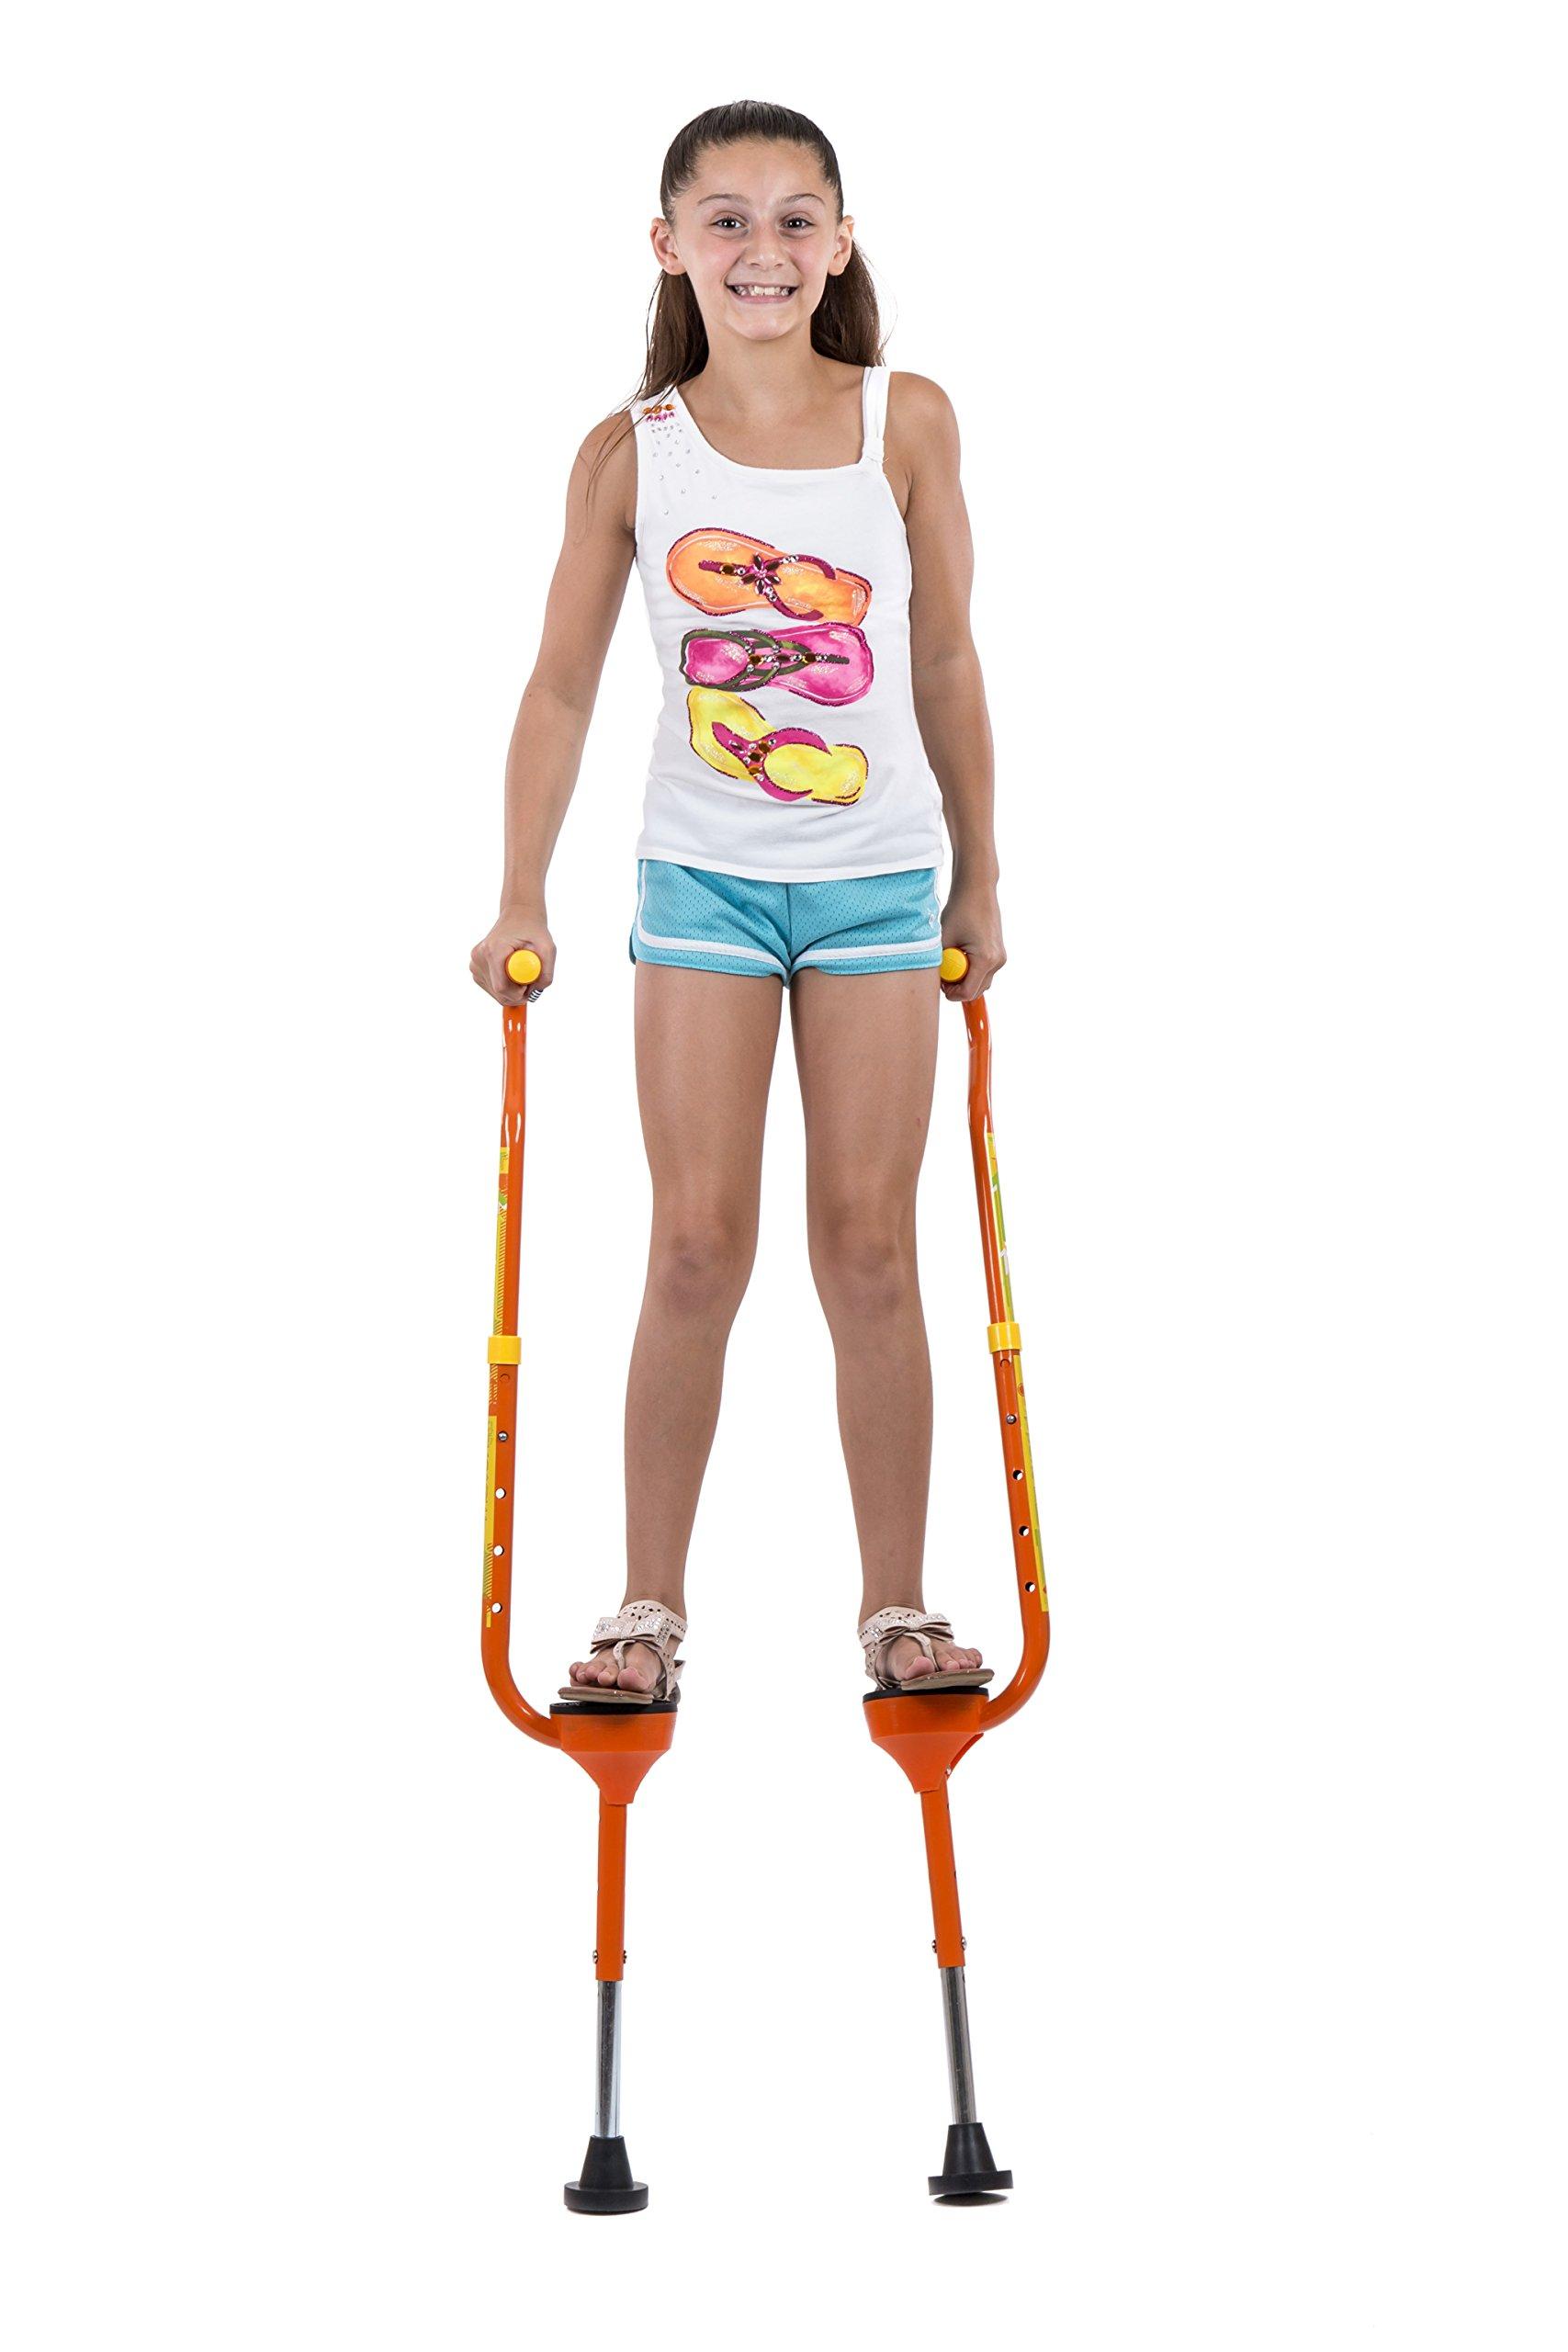 Flybar(R Maverick Small Stilts - Yellow (Weight Limit 190 lbs)